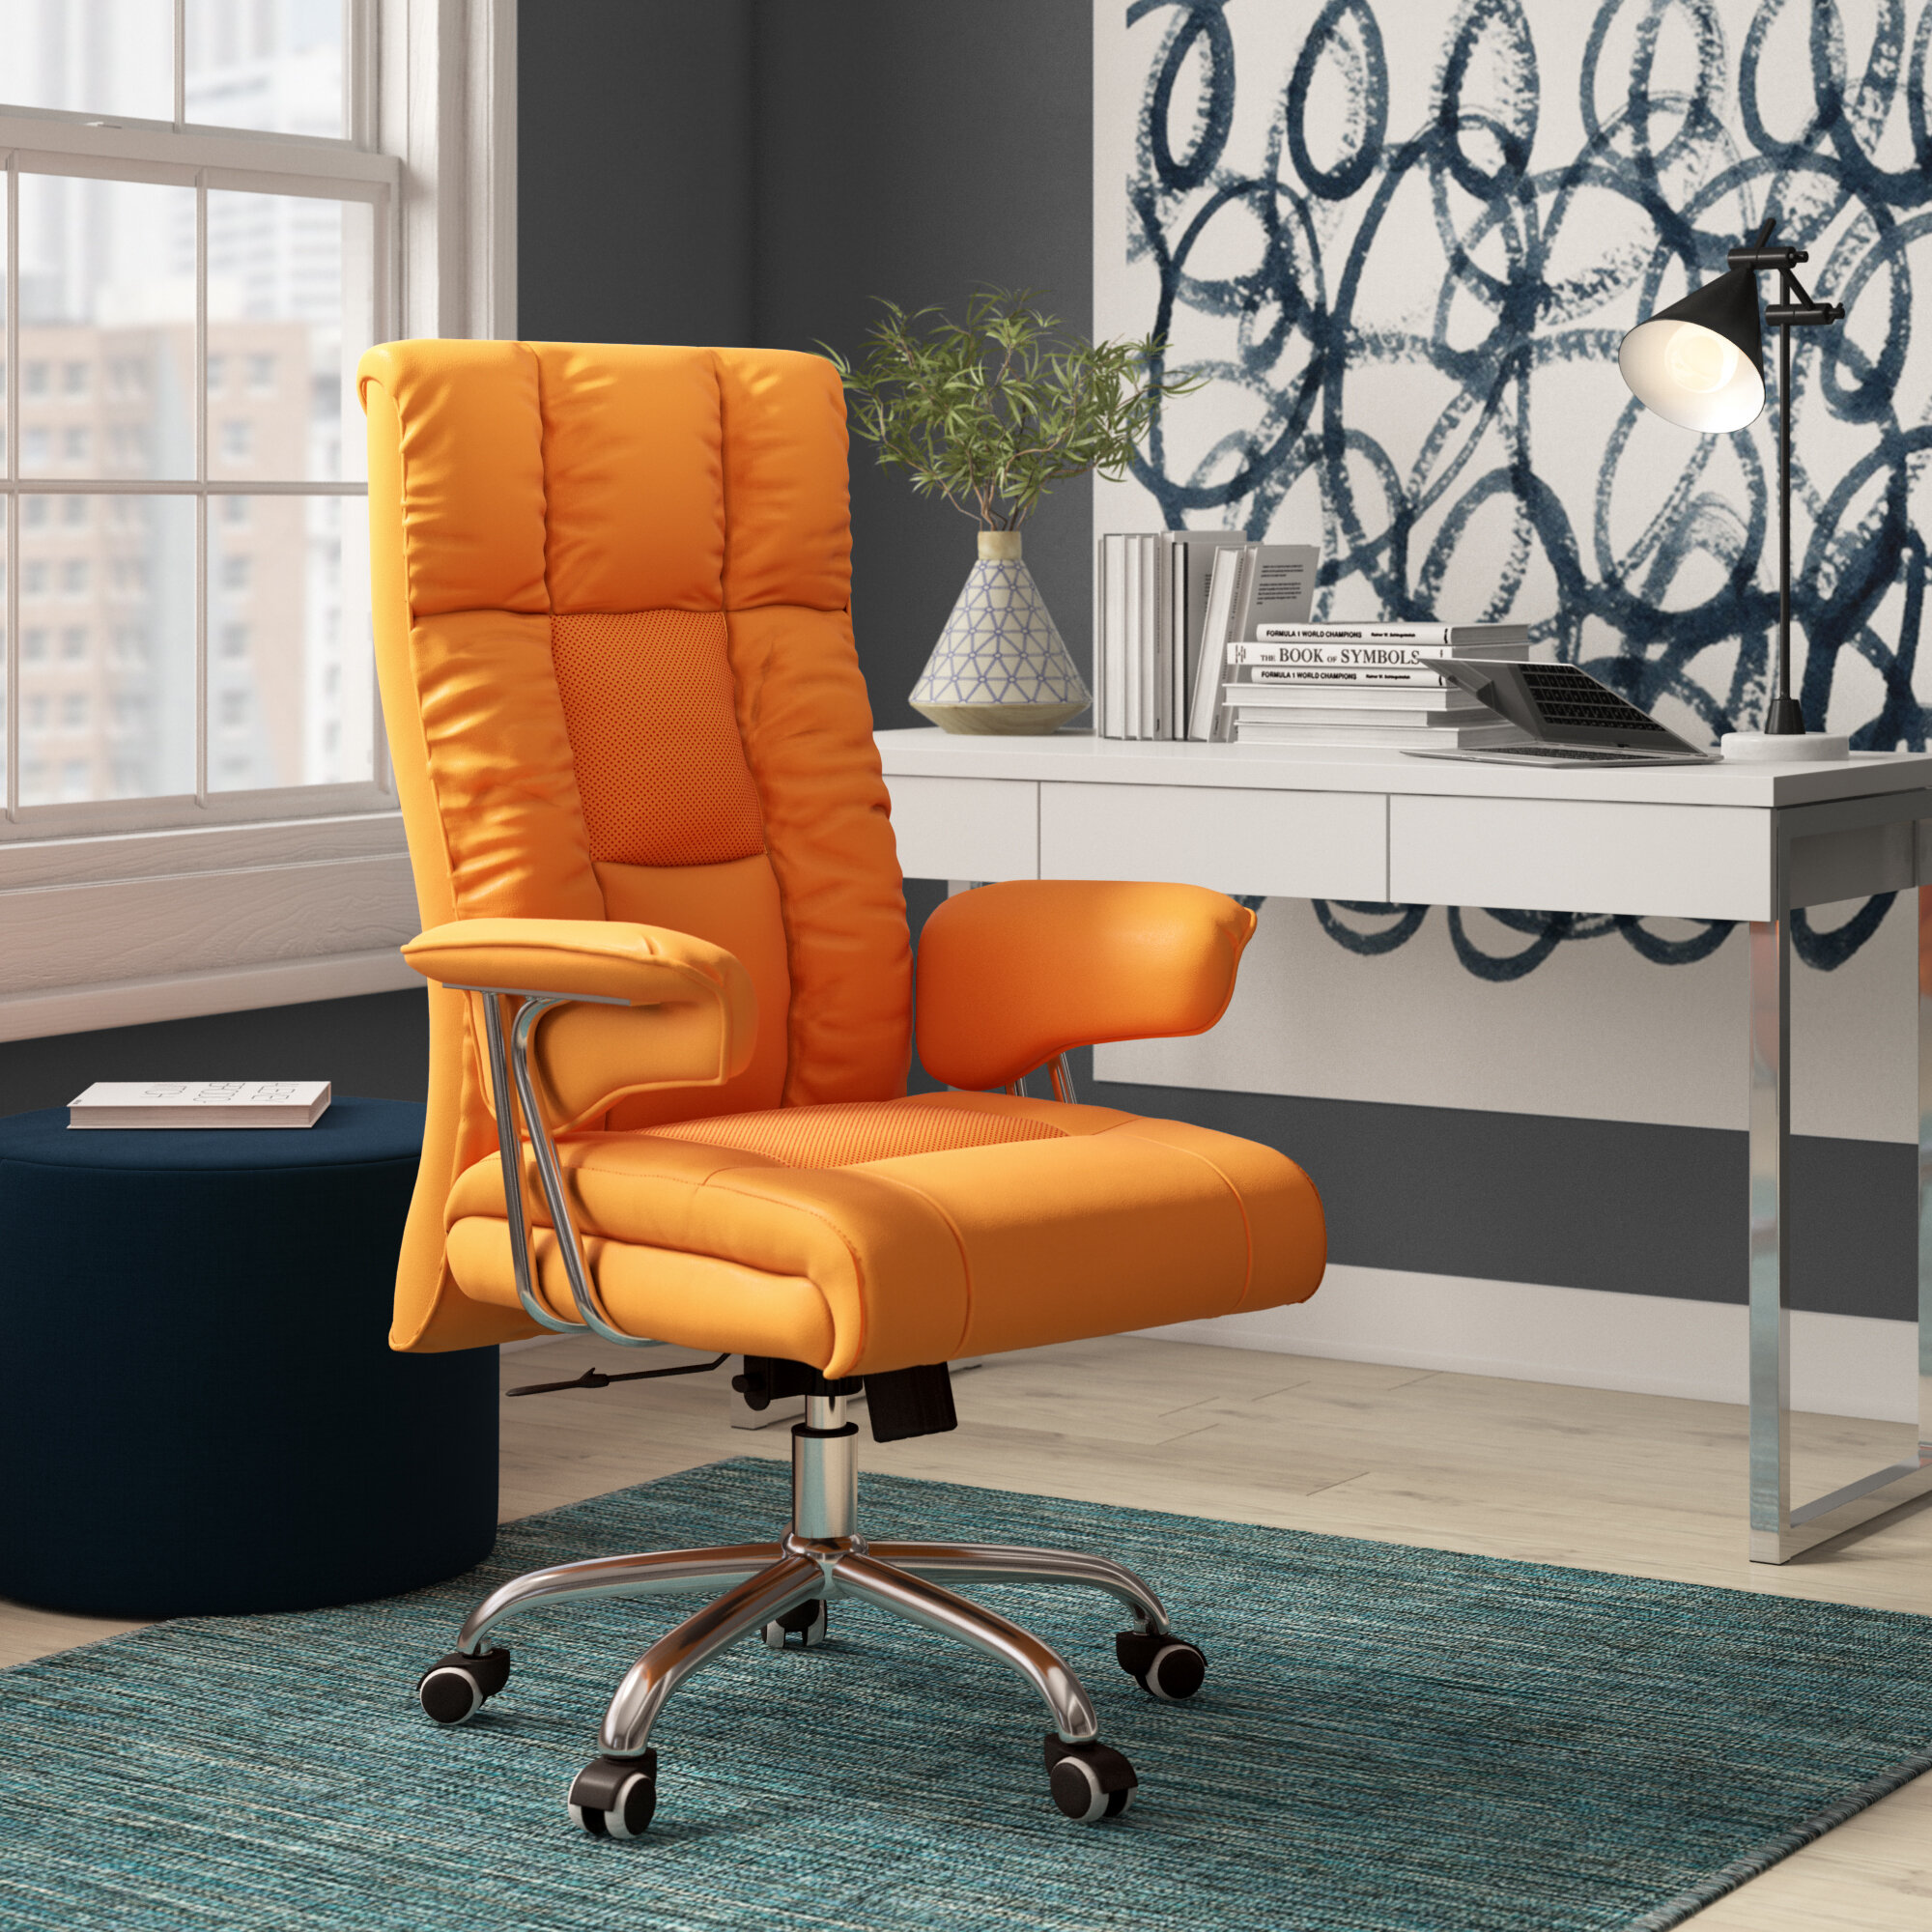 Symple Stuff Soliz Executive Chair Reviews